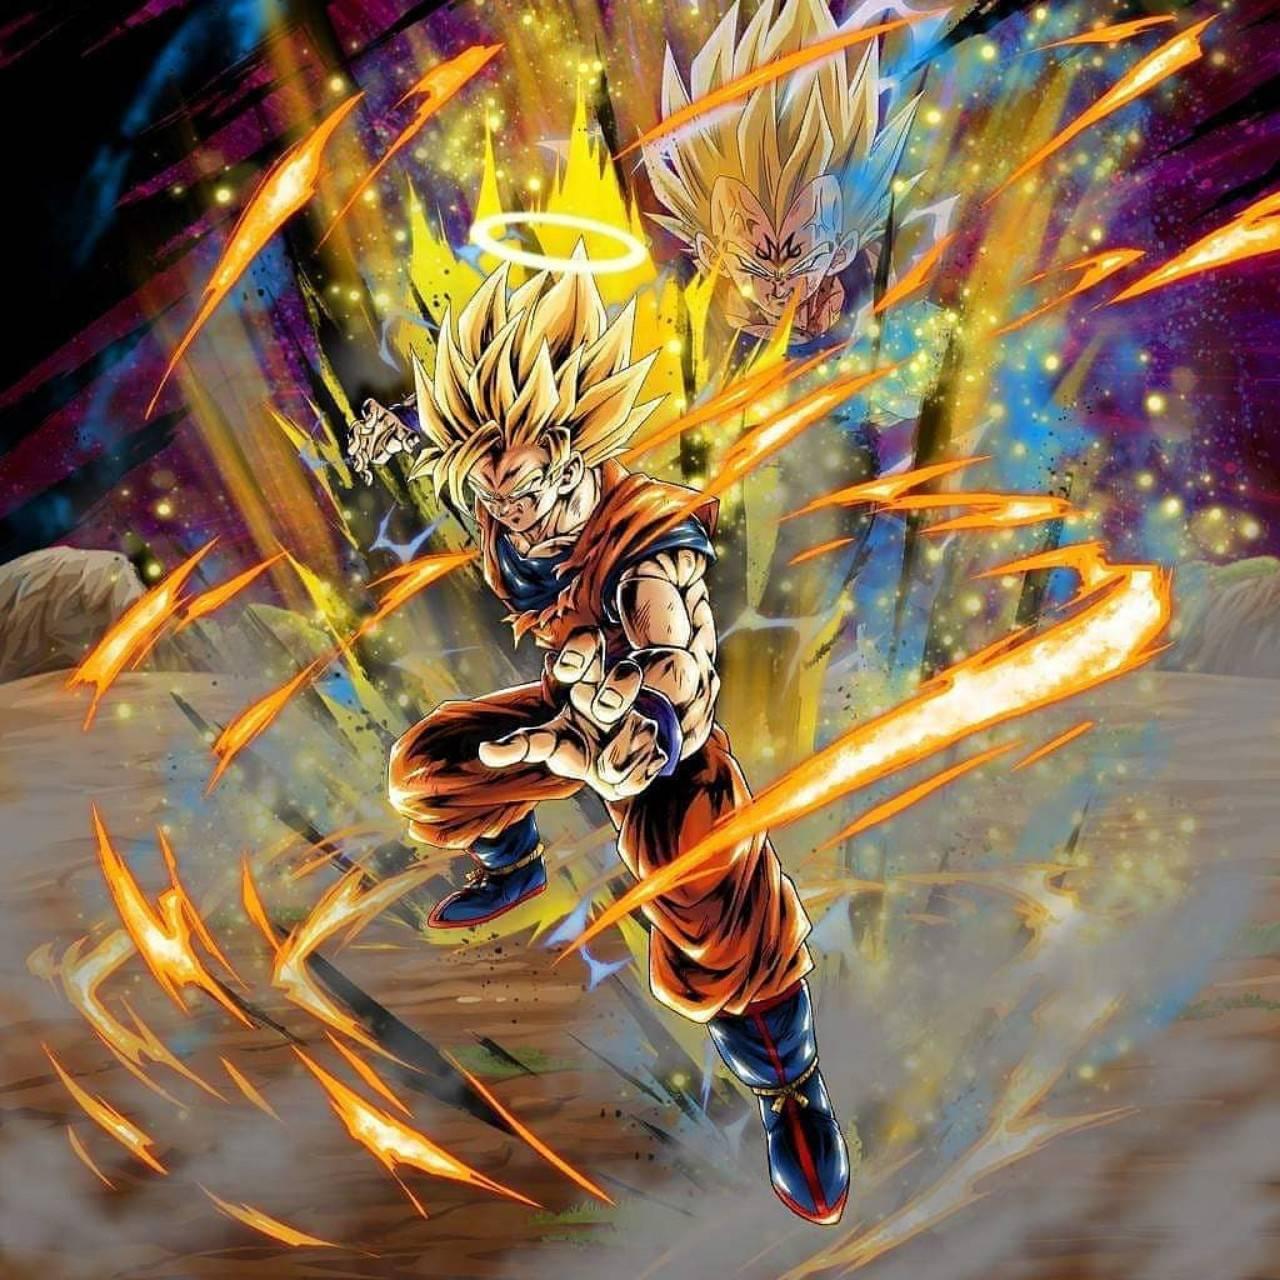 Ssj2 Goku Wallpaper By Dragonballart Fe Free On Zedge